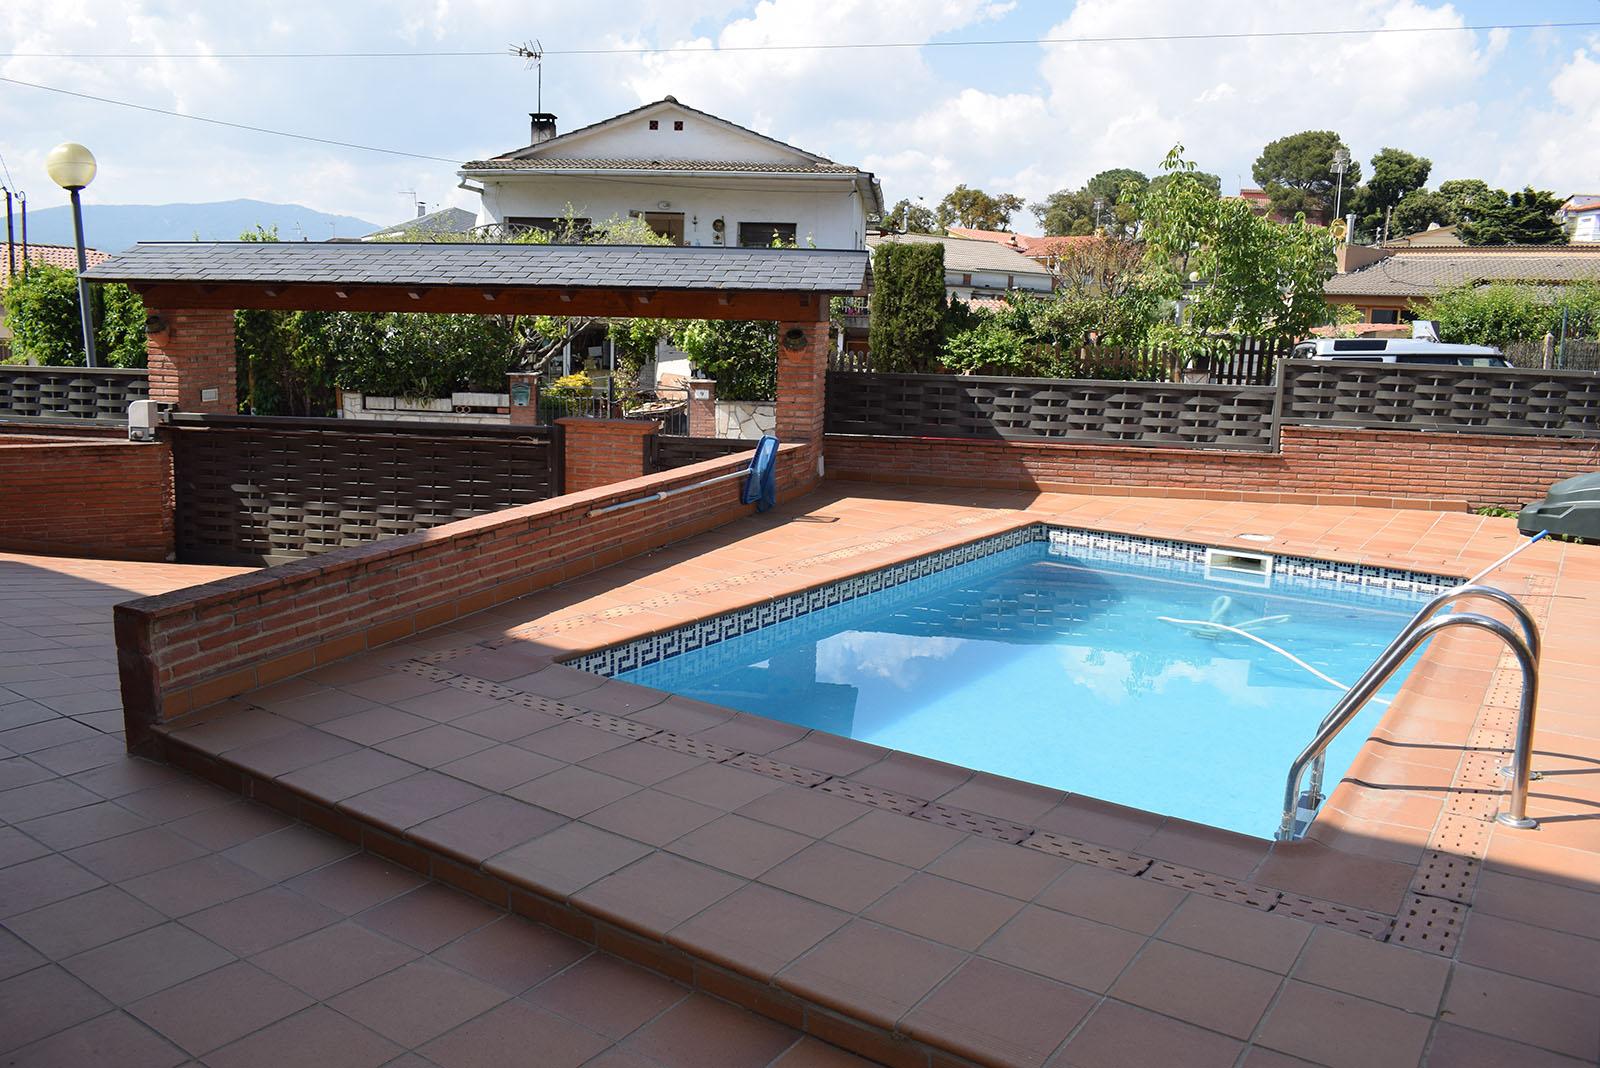 Casa con piscina / Ref. 19619